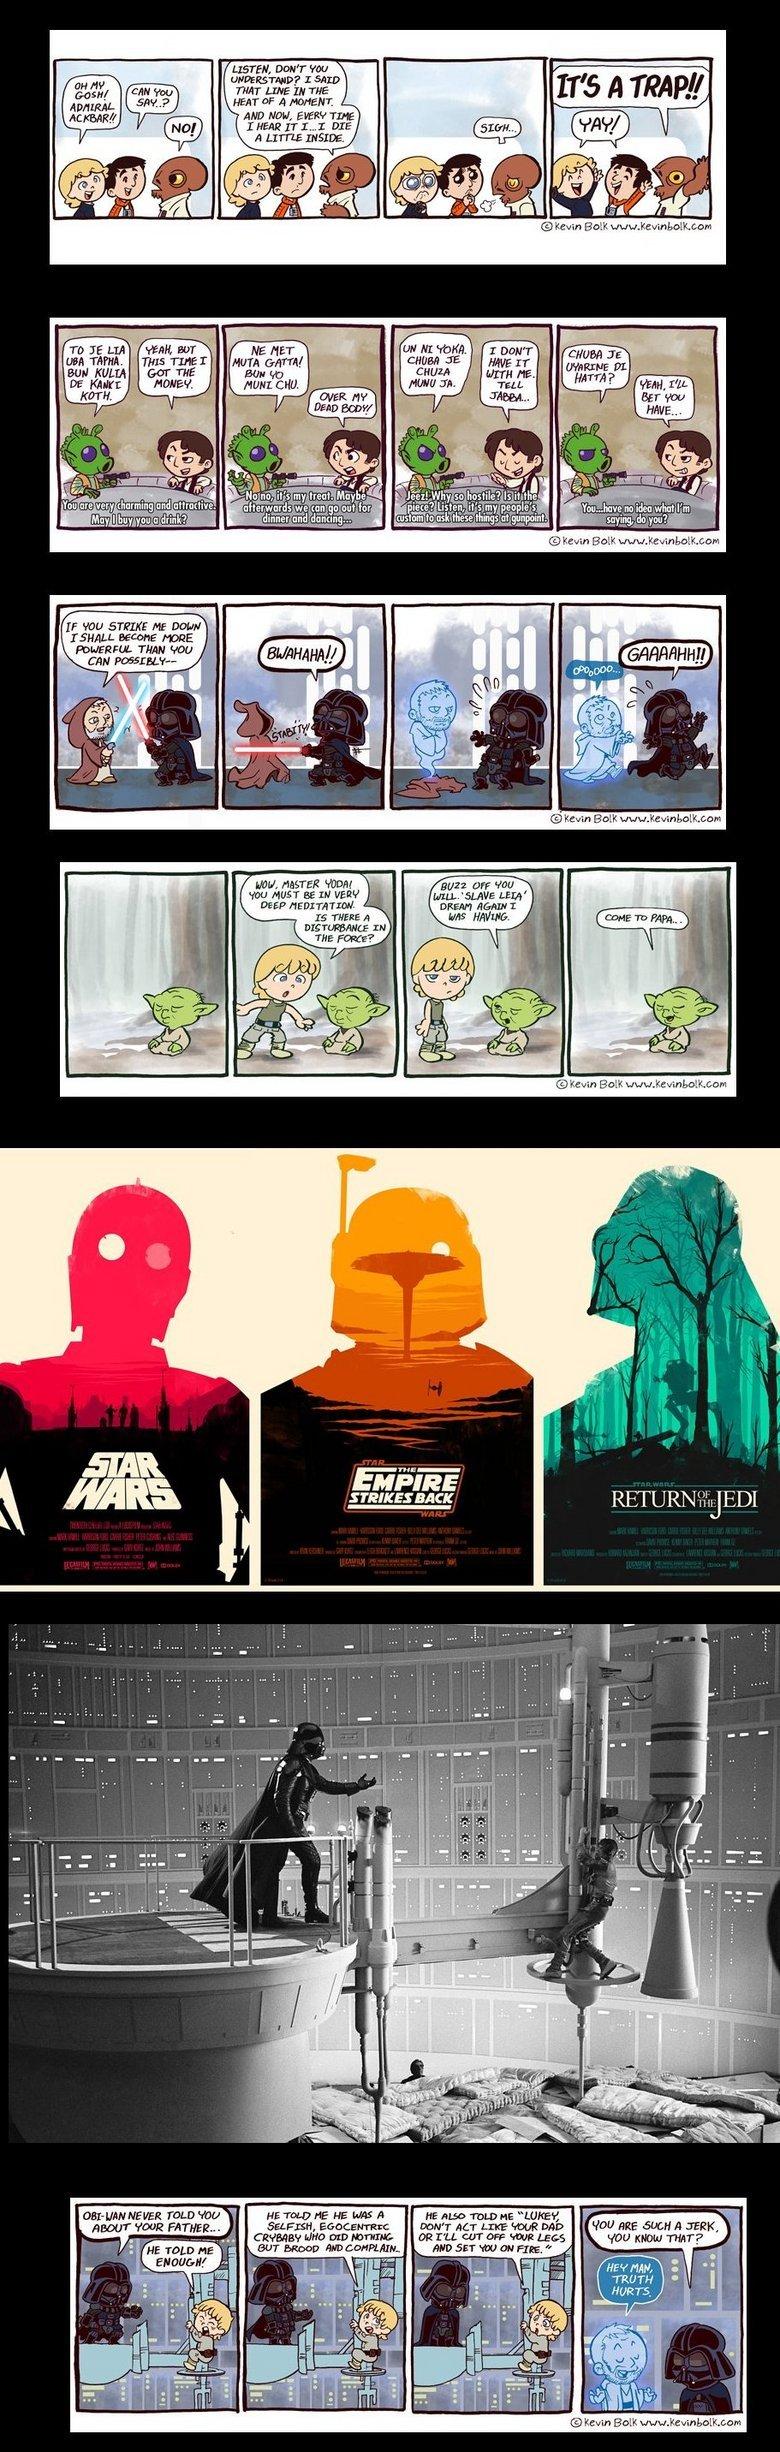 Star Wars Comp. comics by pot luck comics, other pics found stumbling. EEK. DON' T rwr, TEN BE LC, THE G. Ta It MEN! A LINE INSIDE. _ TD IE an wink EDT ' ROII [ Star Wars Comp comics by pot luck other pics found stumbling EEK DON' T rwr TEN BE LC THE G Ta It MEN! A LINE INSIDE _ TD IE an wink EDT ' ROII [